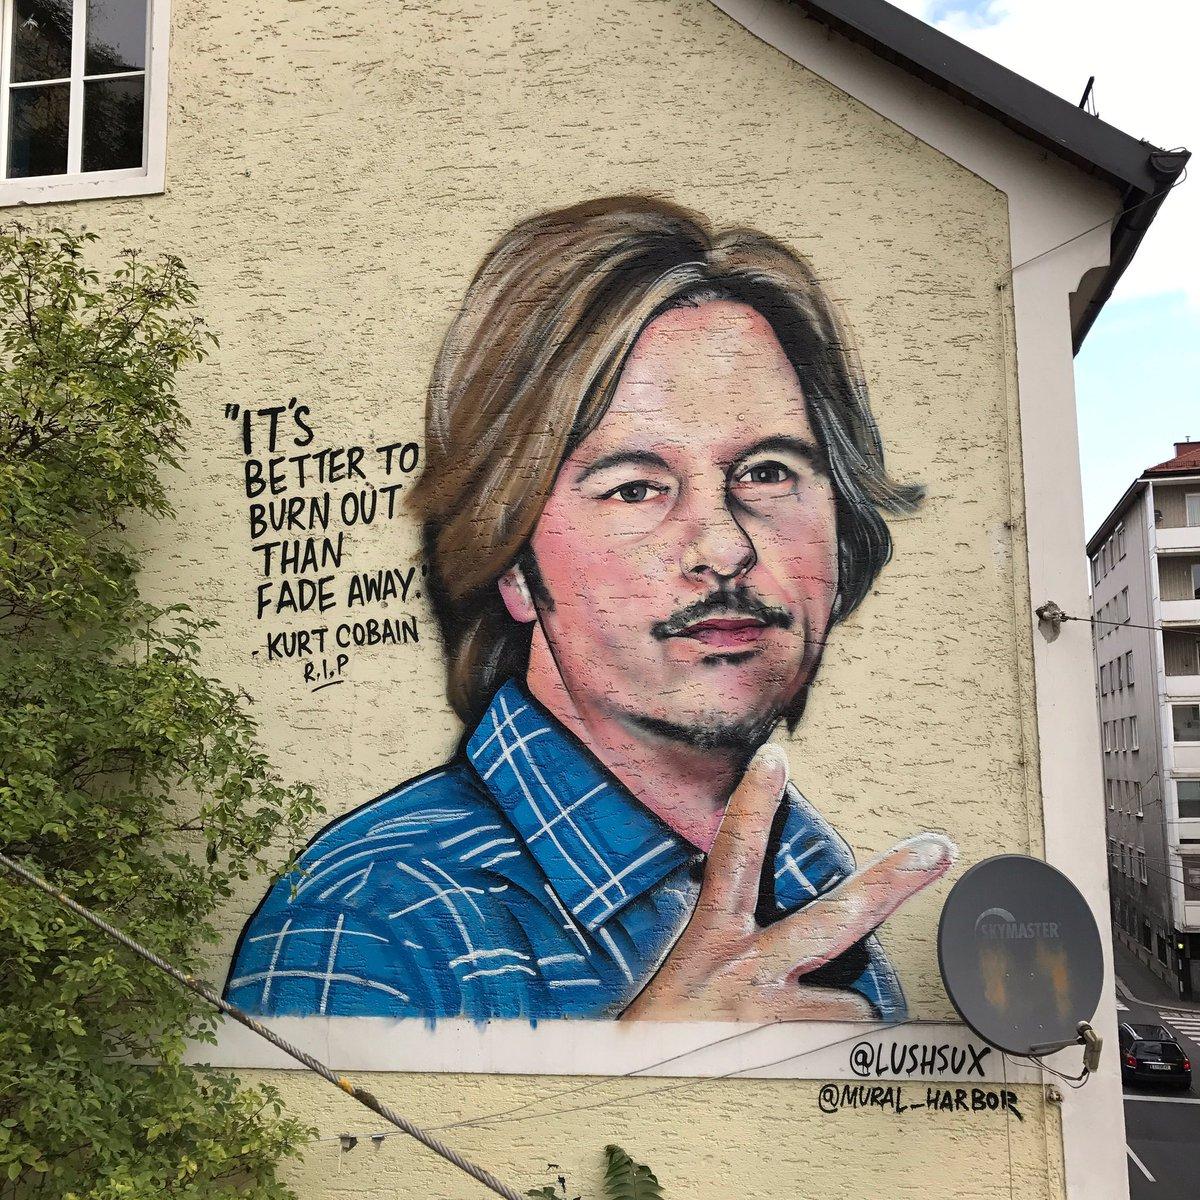 Ever confused David Spade for Kurt Cobain?